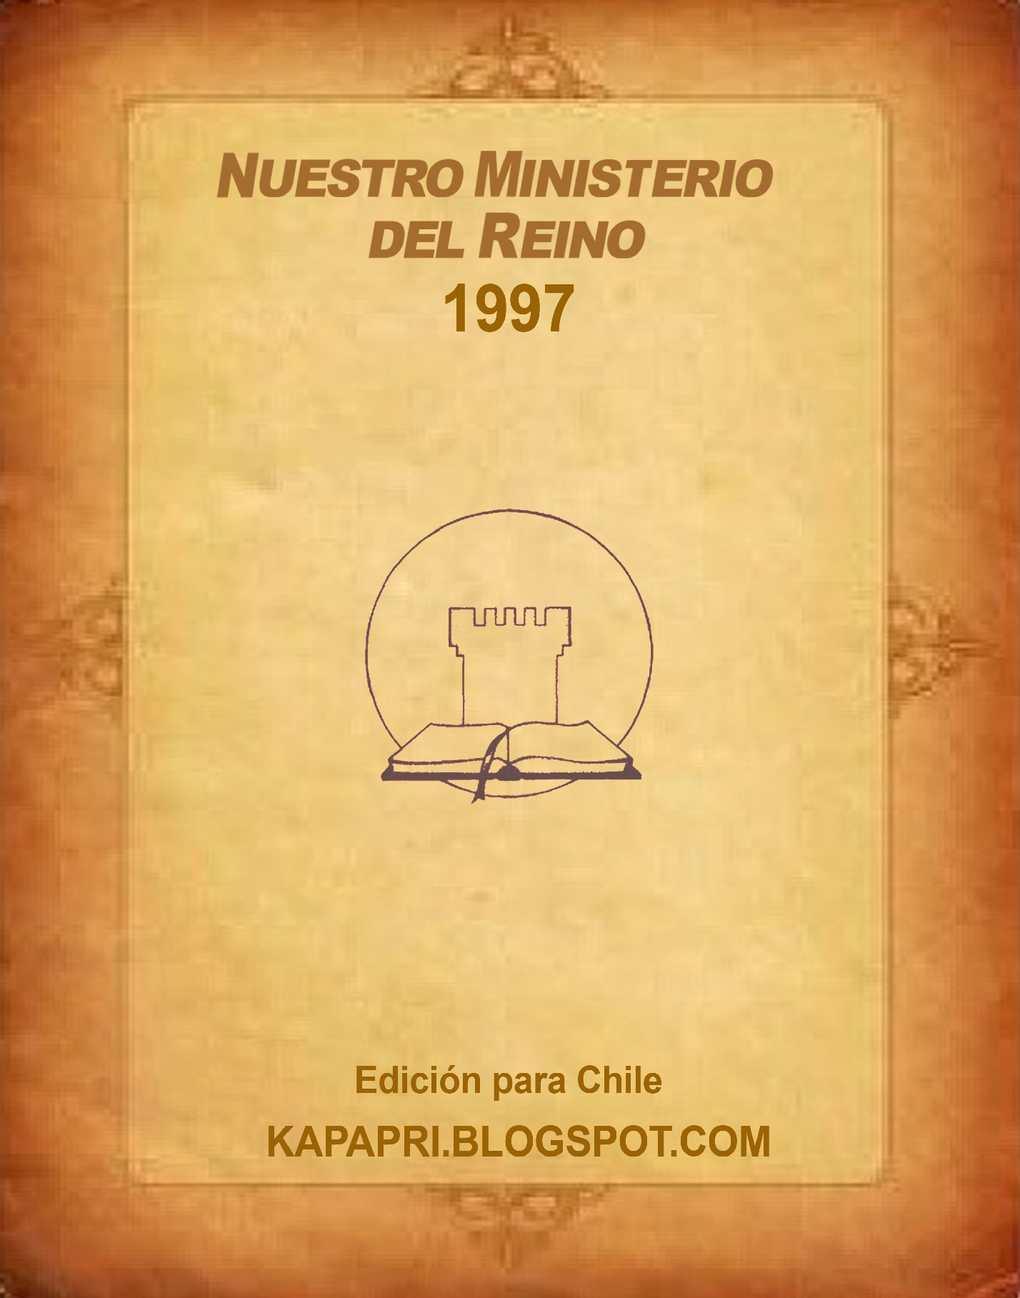 Calaméo - 1997 Nuestro Ministerio del Reino